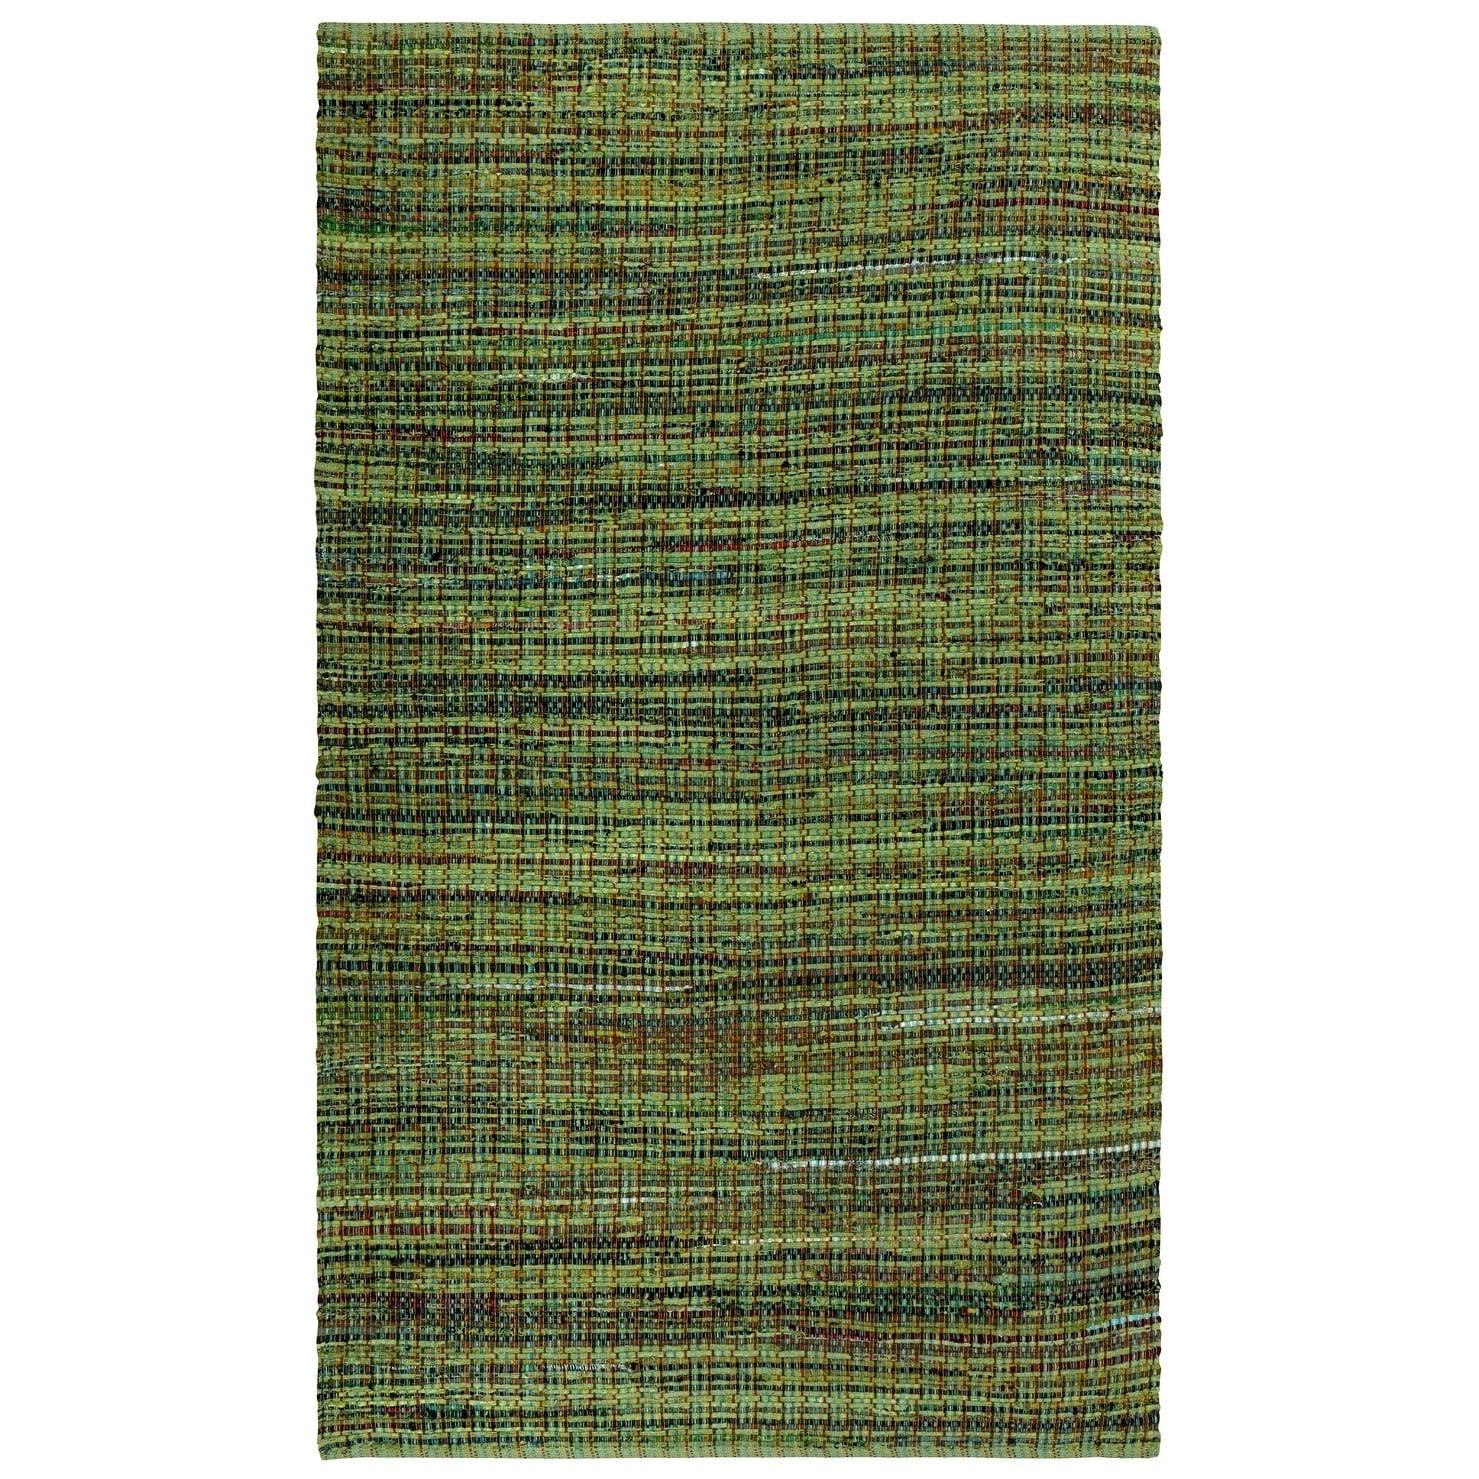 Complex Green 4x6 Woven Cotton Rug - 4 x 6 (Green - 4 x 6)